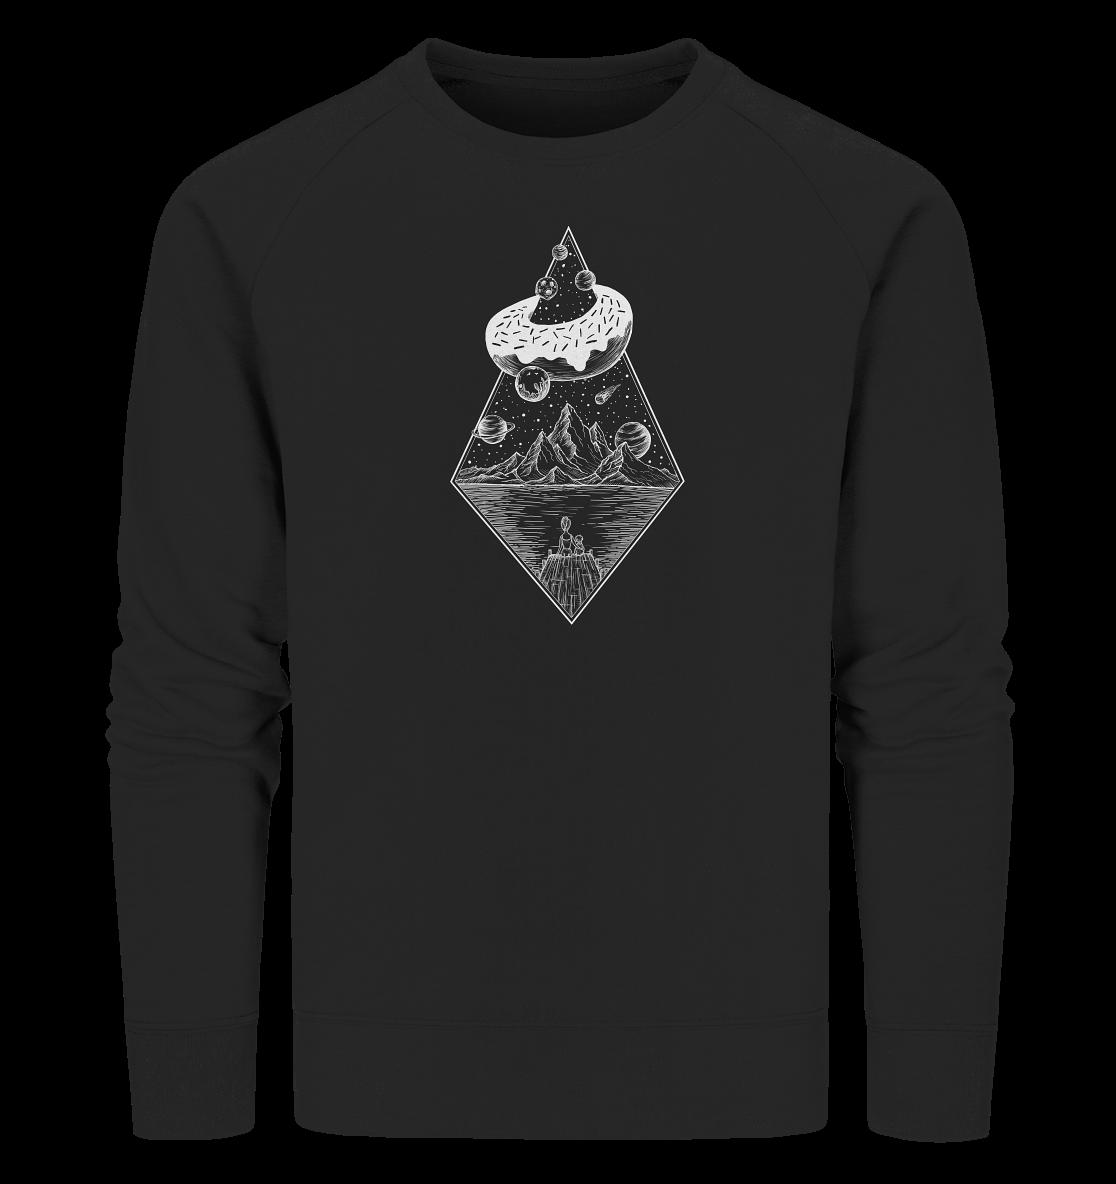 front-organic-sweatshirt-272727-1116x-1.png